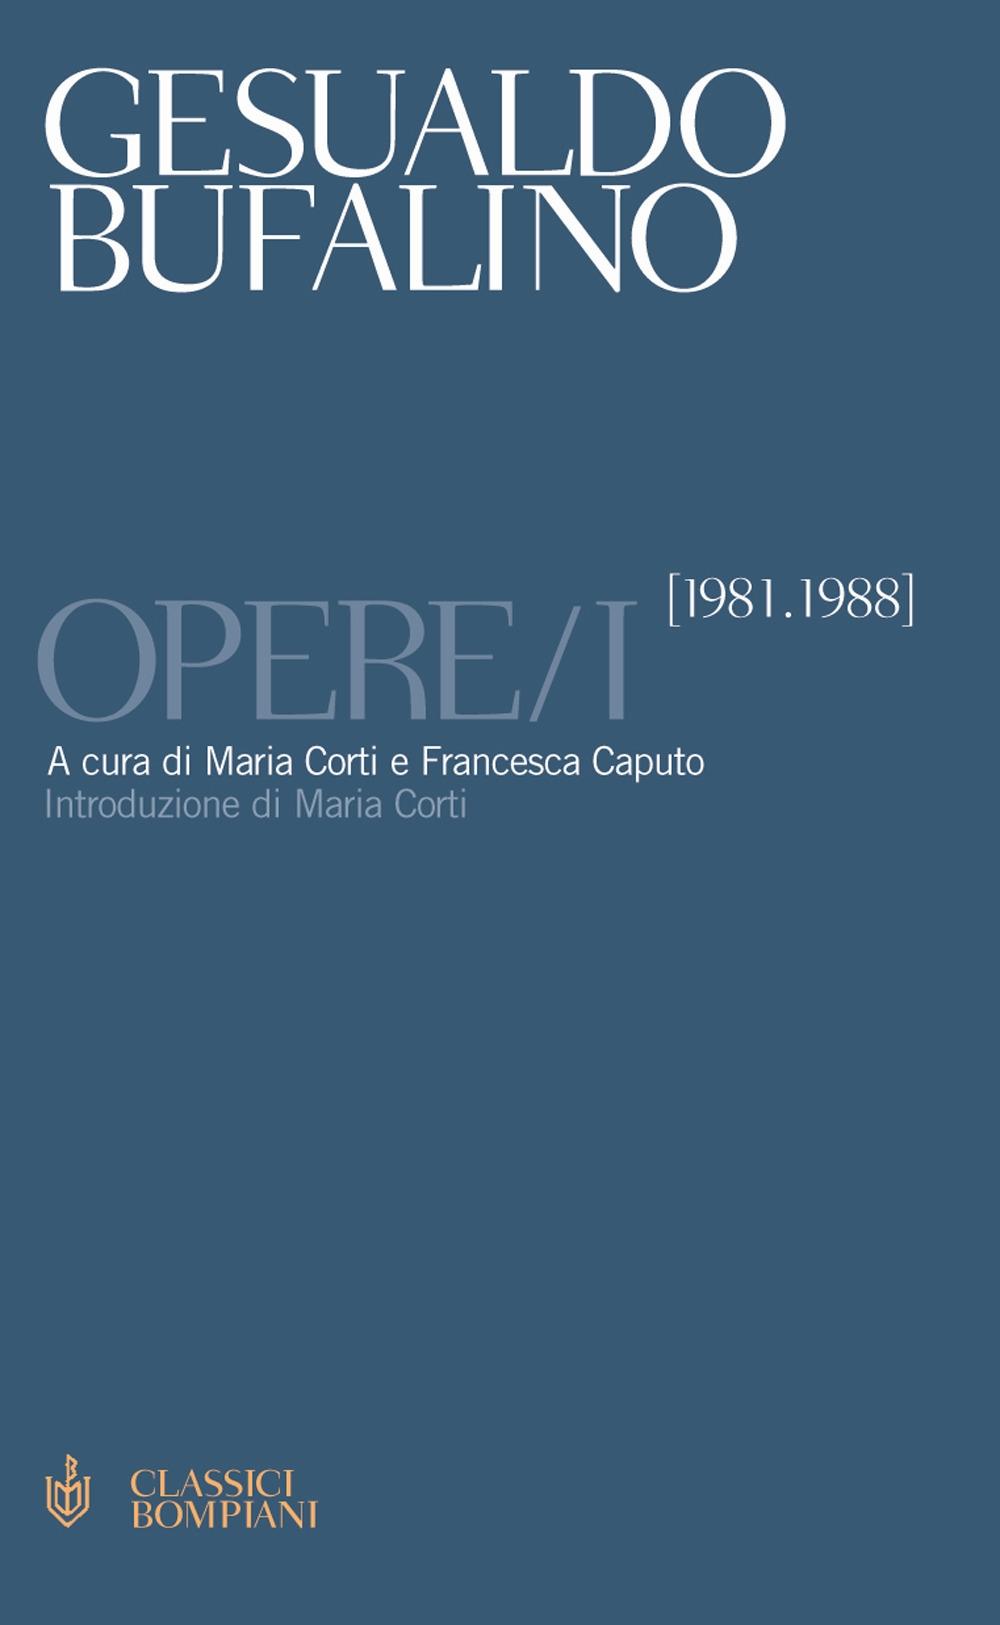 Opere. Vol. 1: 1981-1988 - Bufalino, Gesualdo